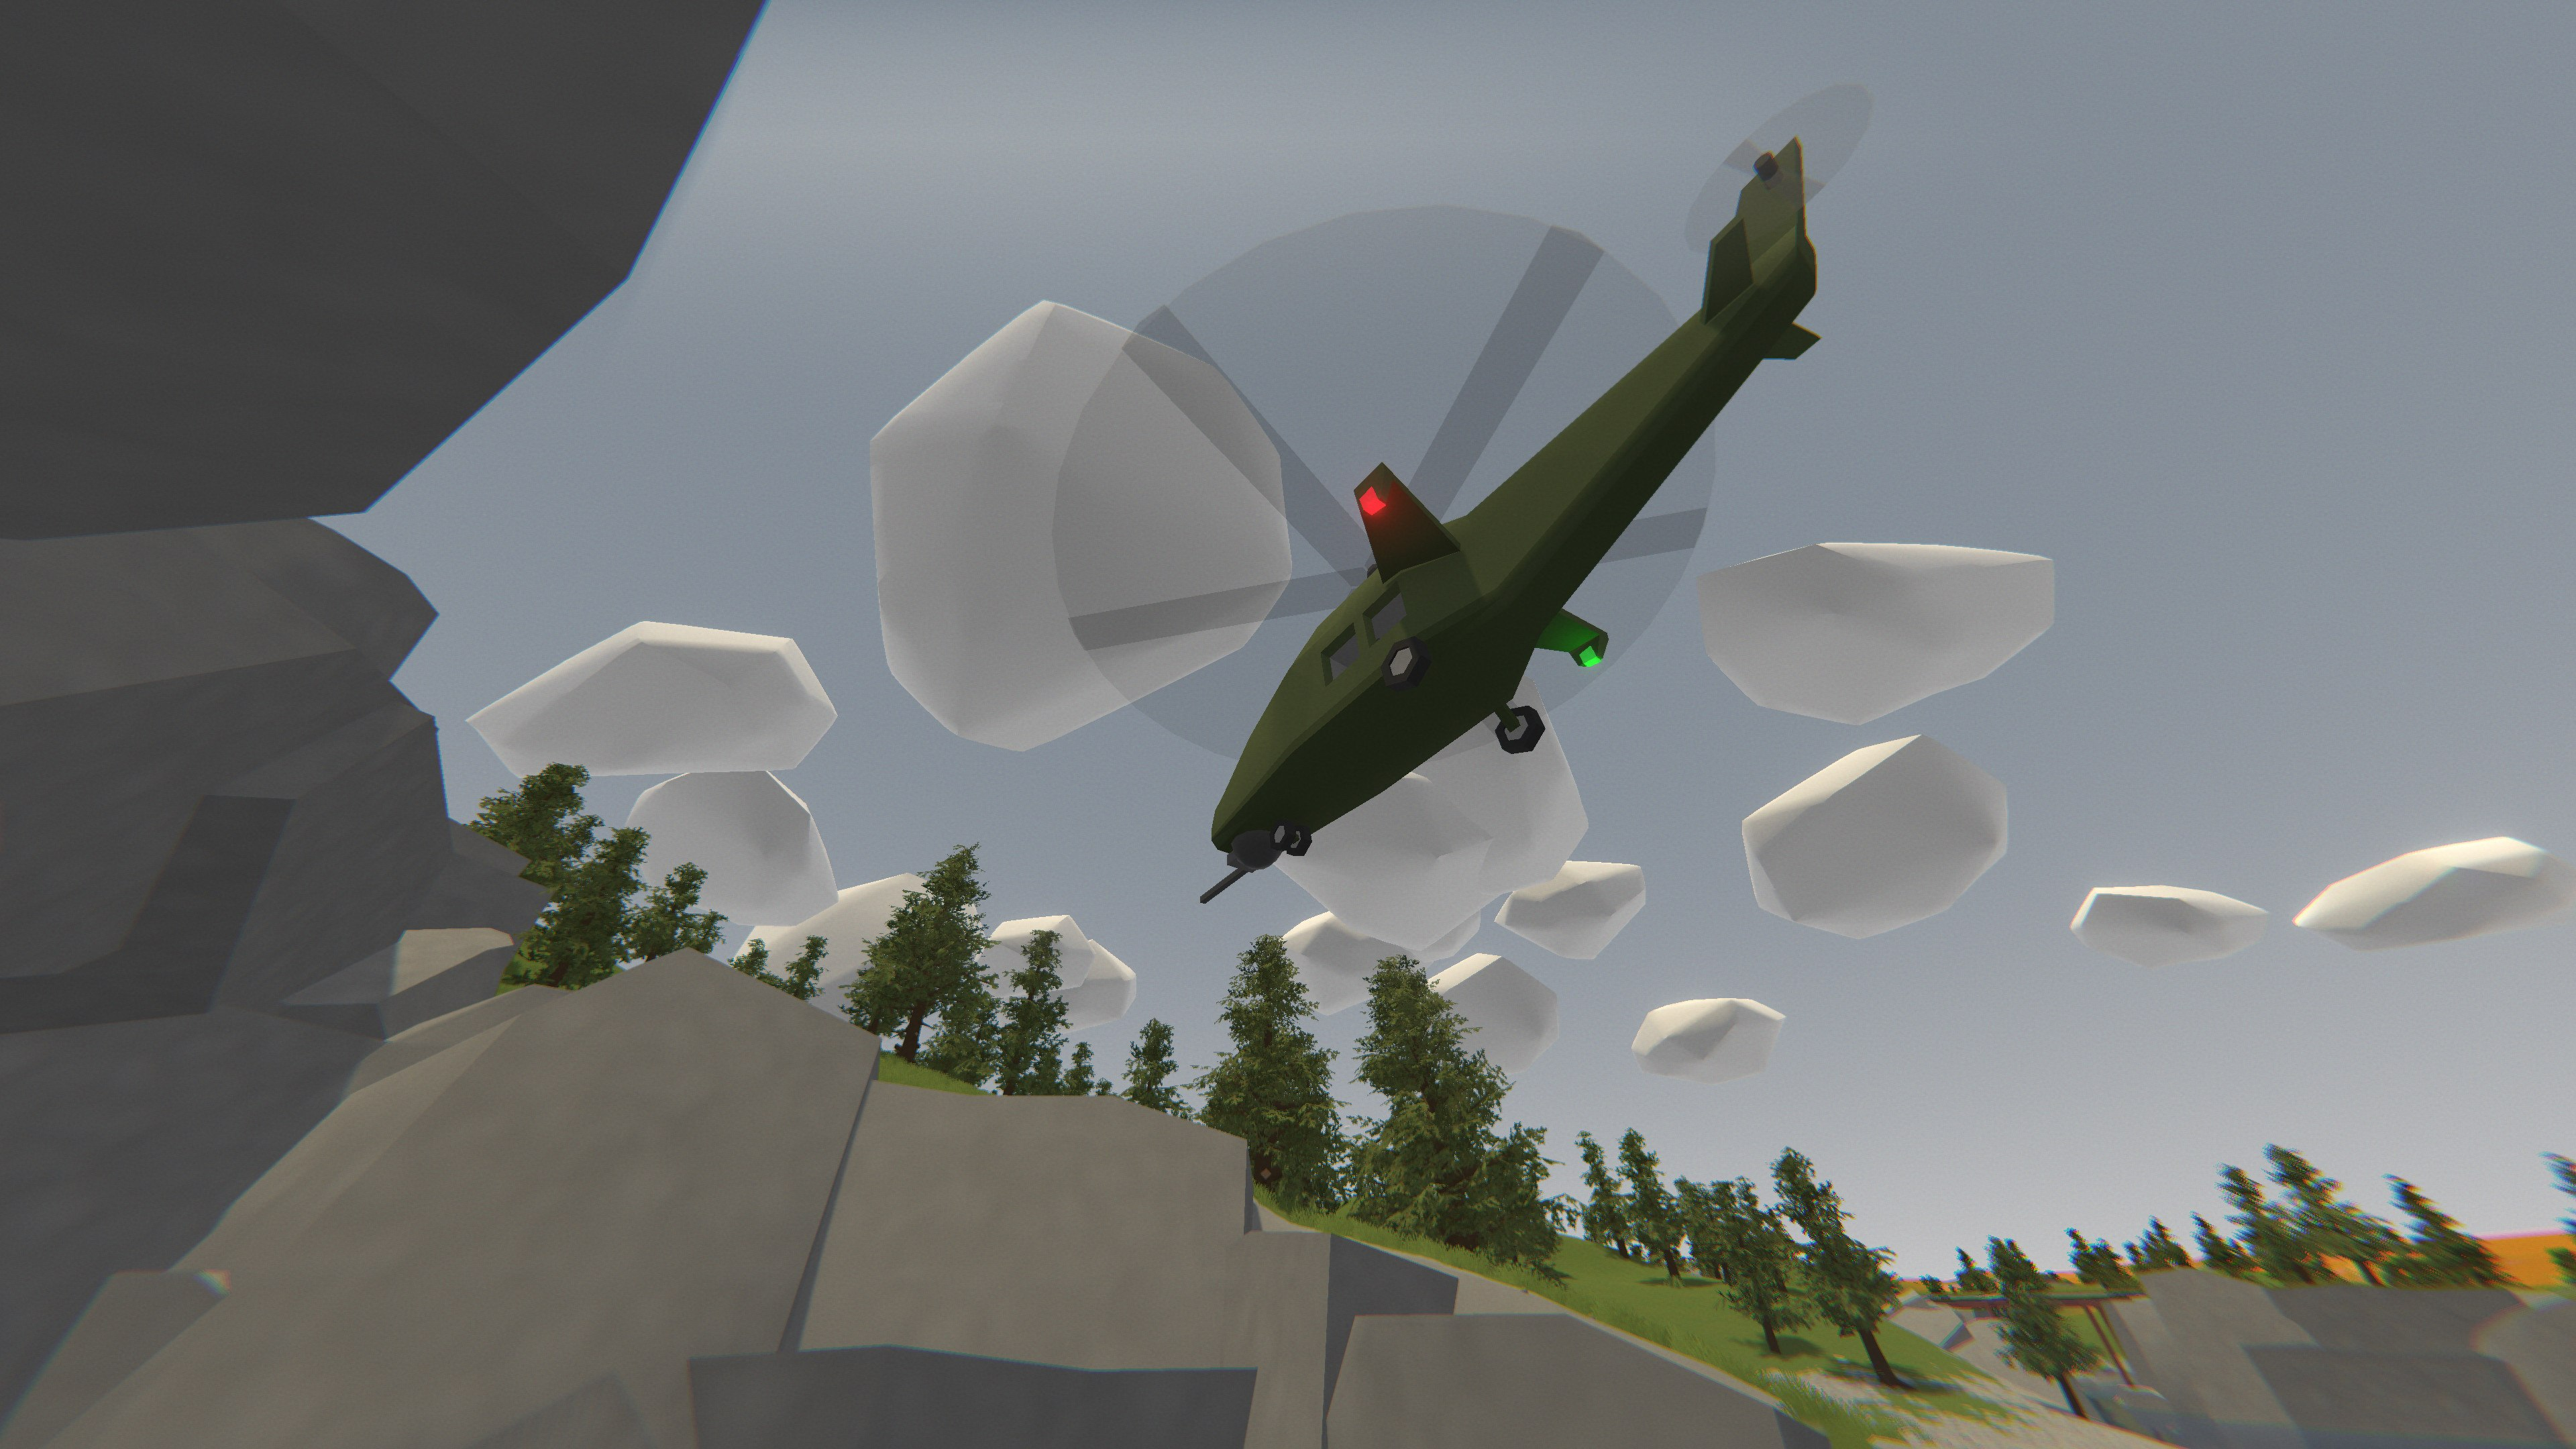 5-gier-podobnych-do-minecraft-unturned-7.jpg